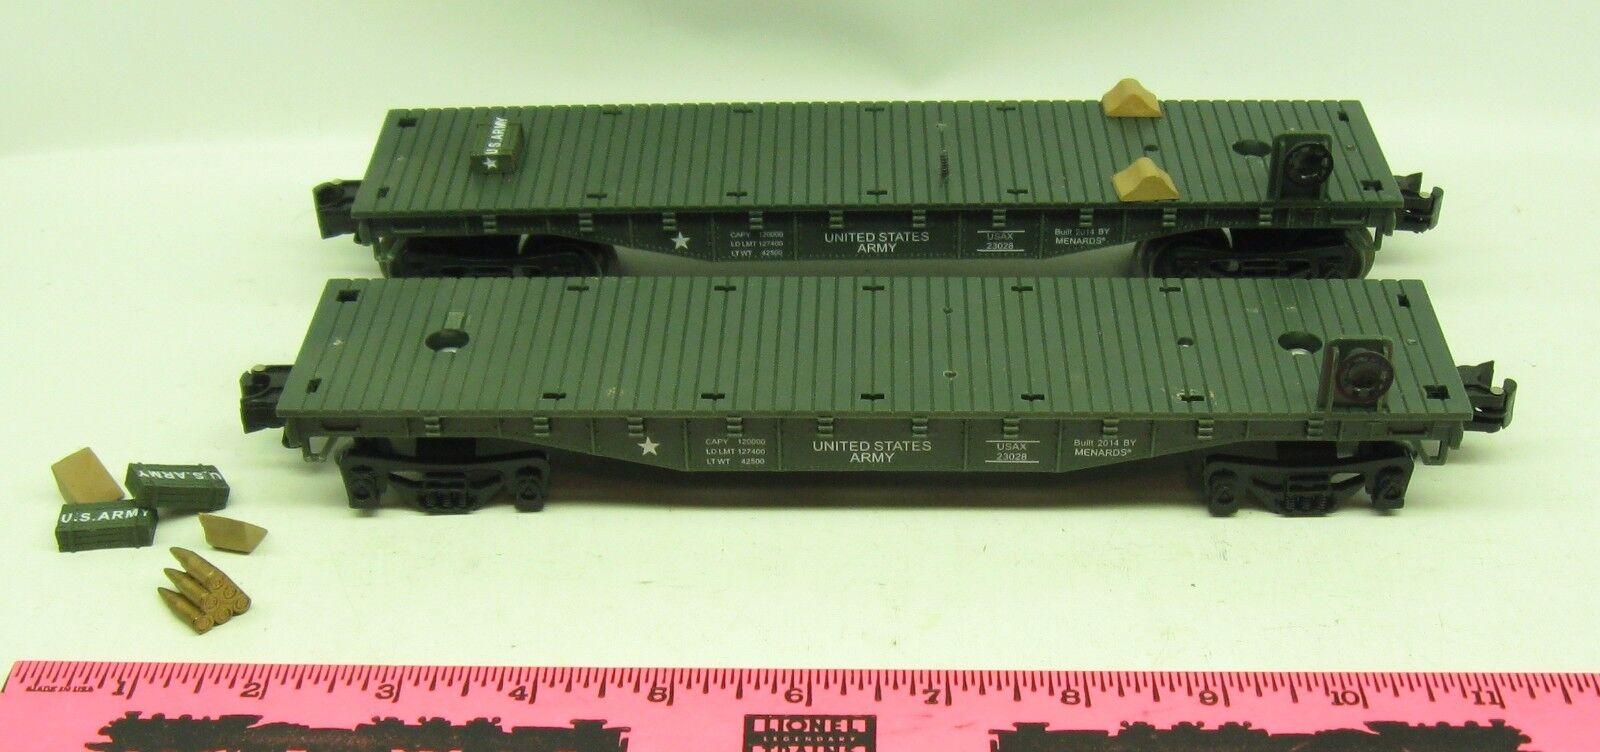 Menards   2  U.S. Army flatcar parts